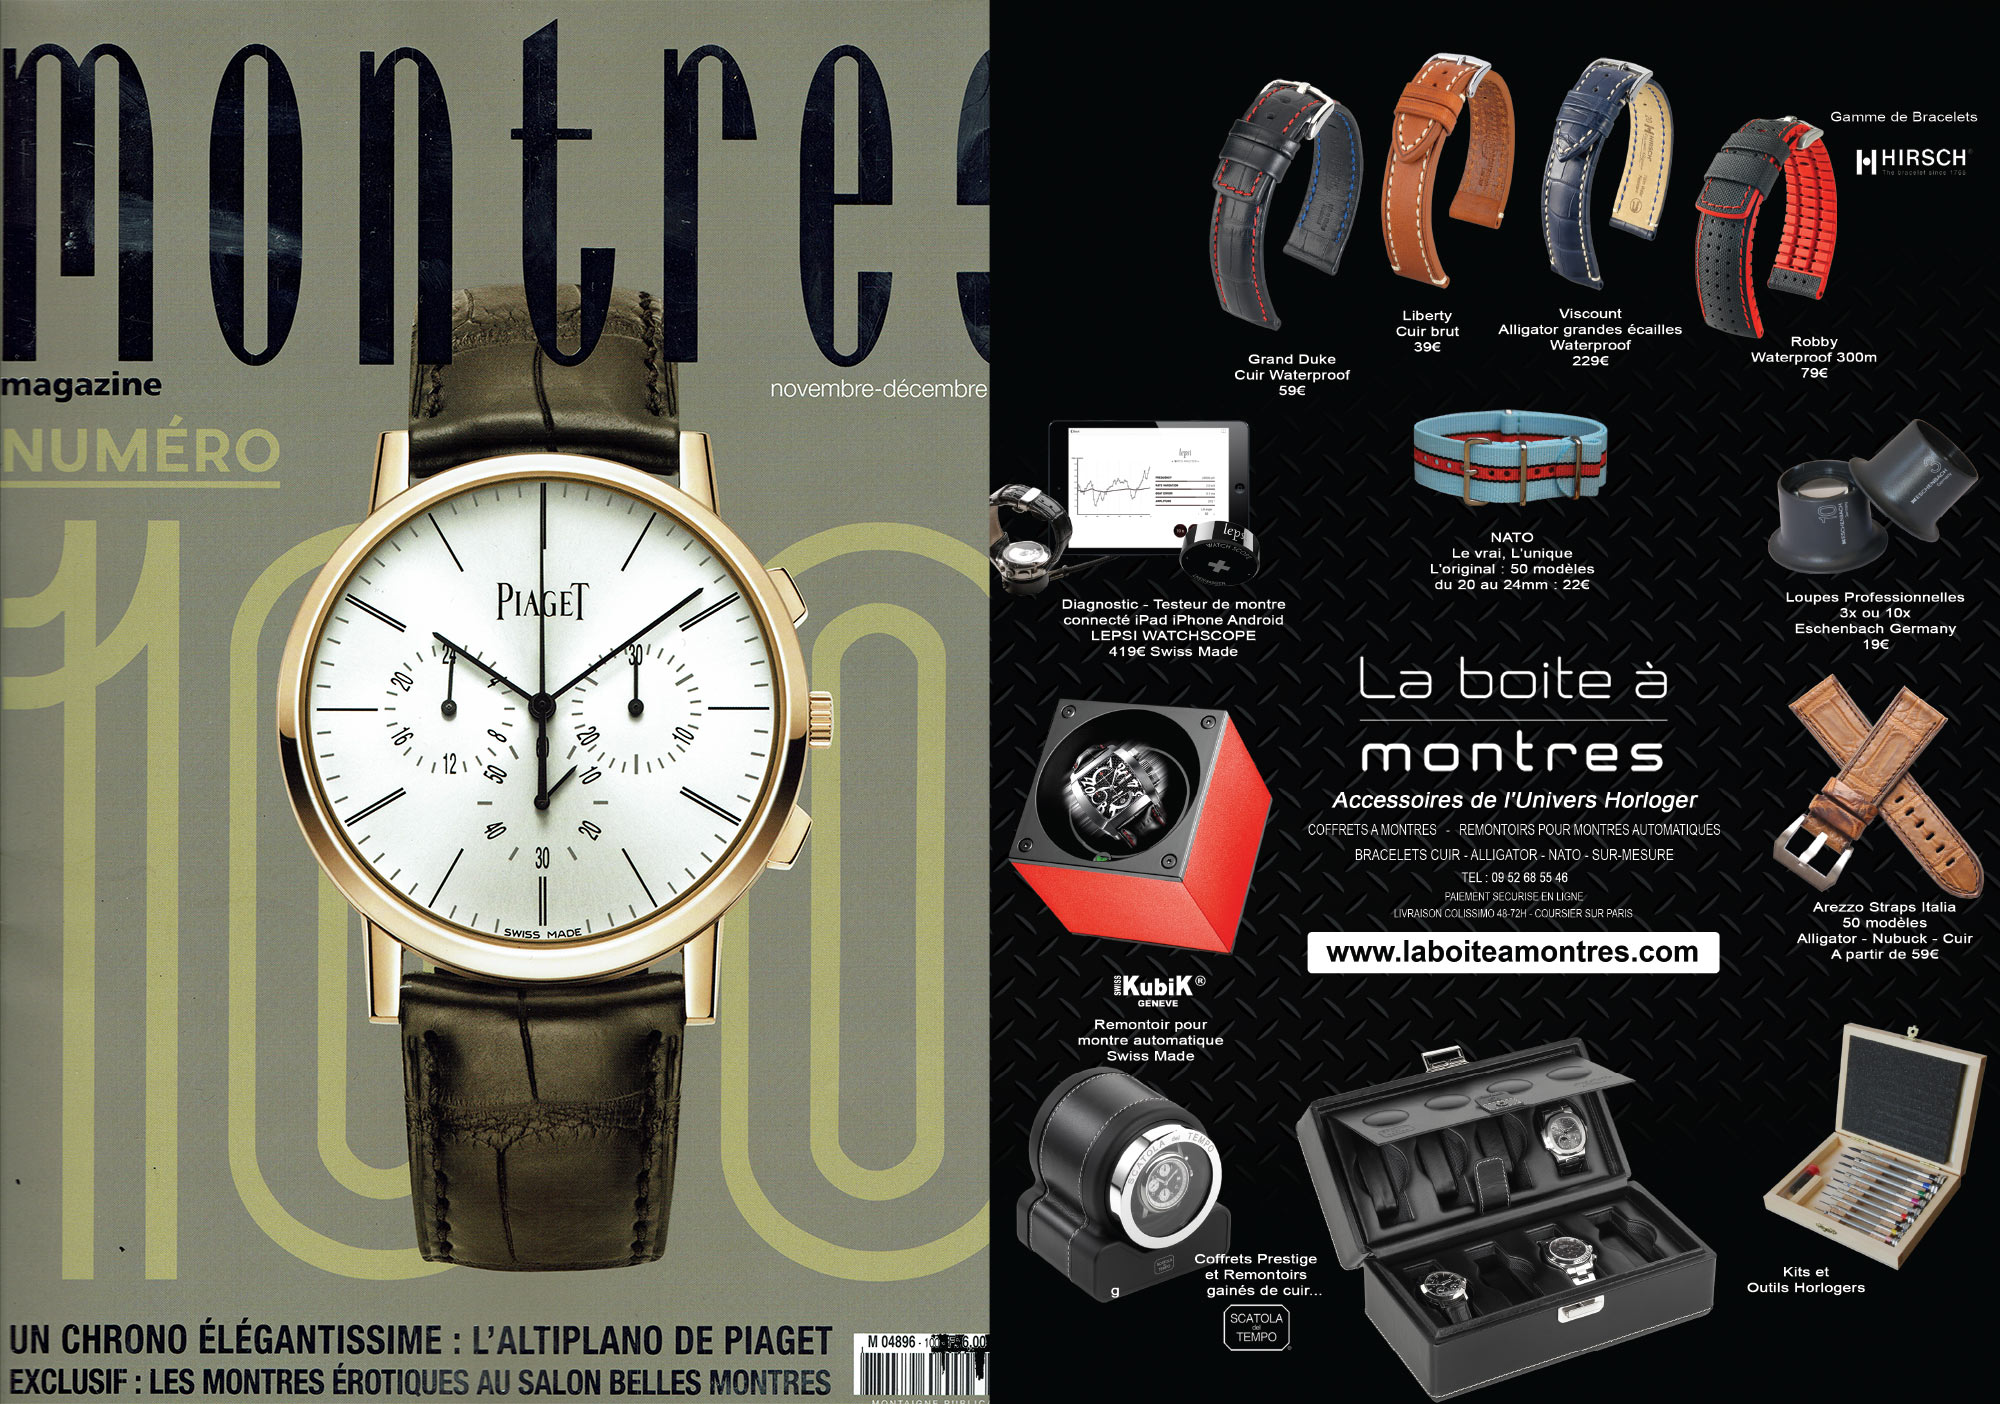 montres magazine laboiteamontres.com